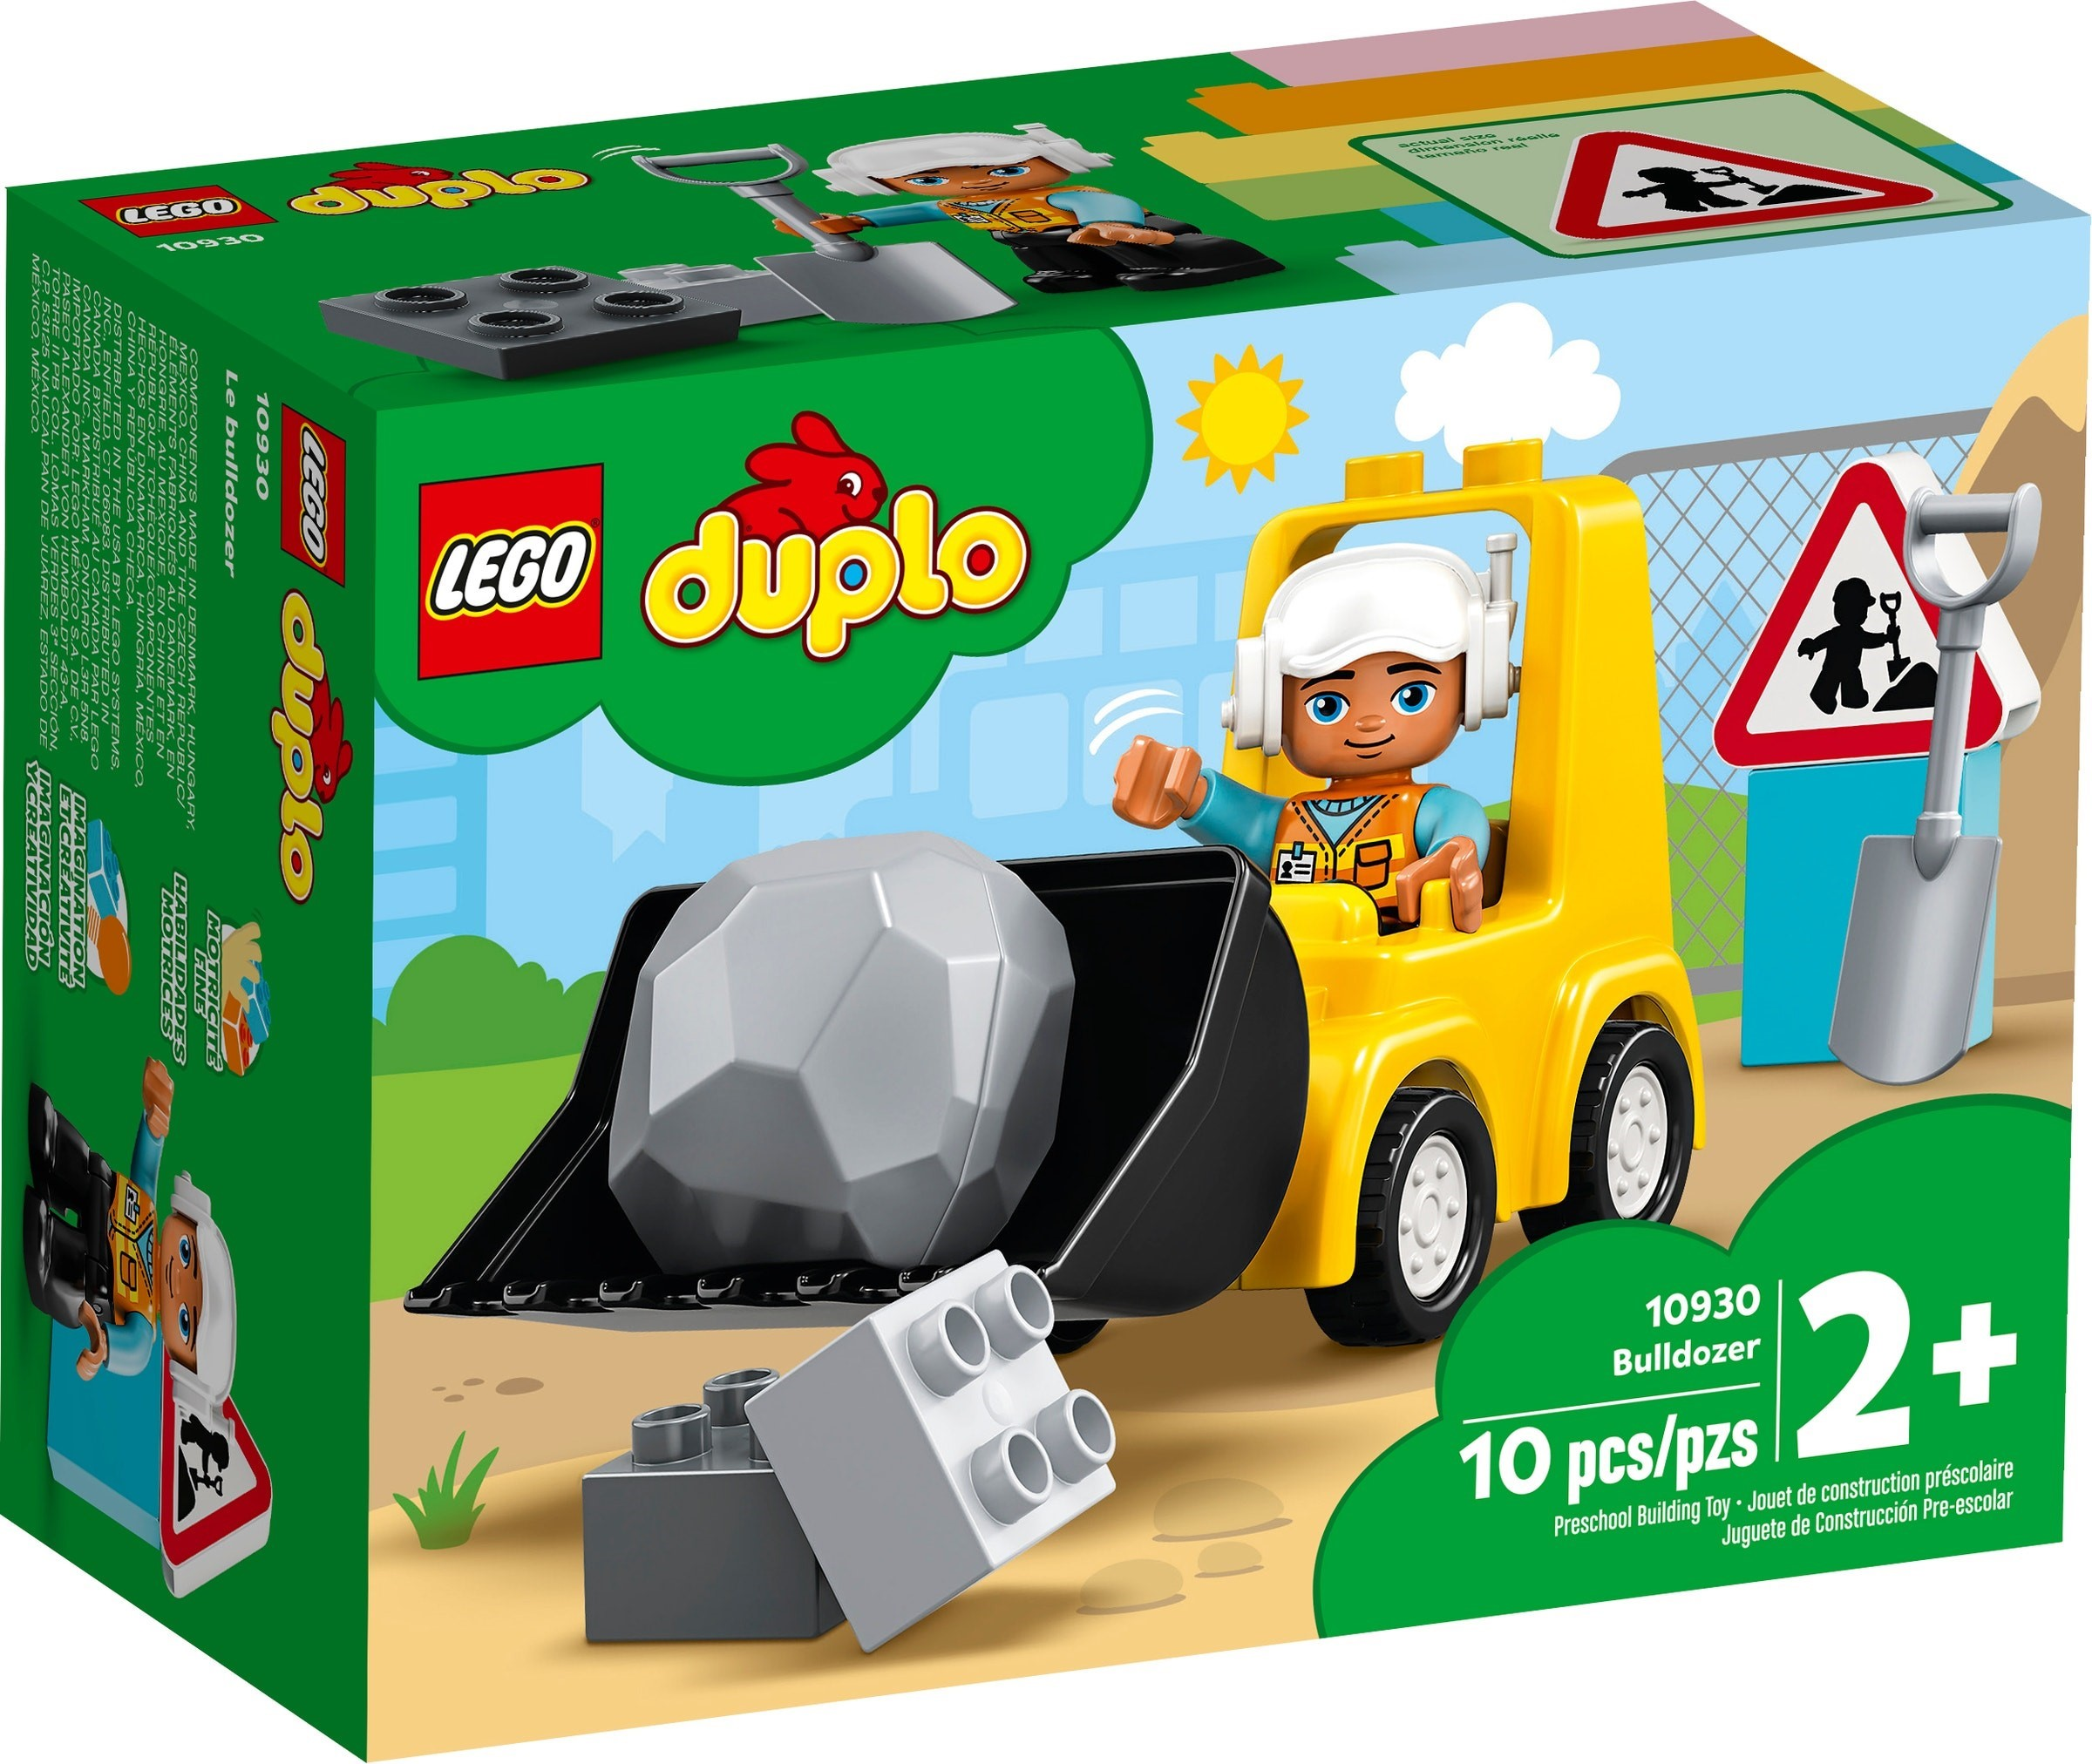 LEGO DUPLO - Bulldozer (10930)